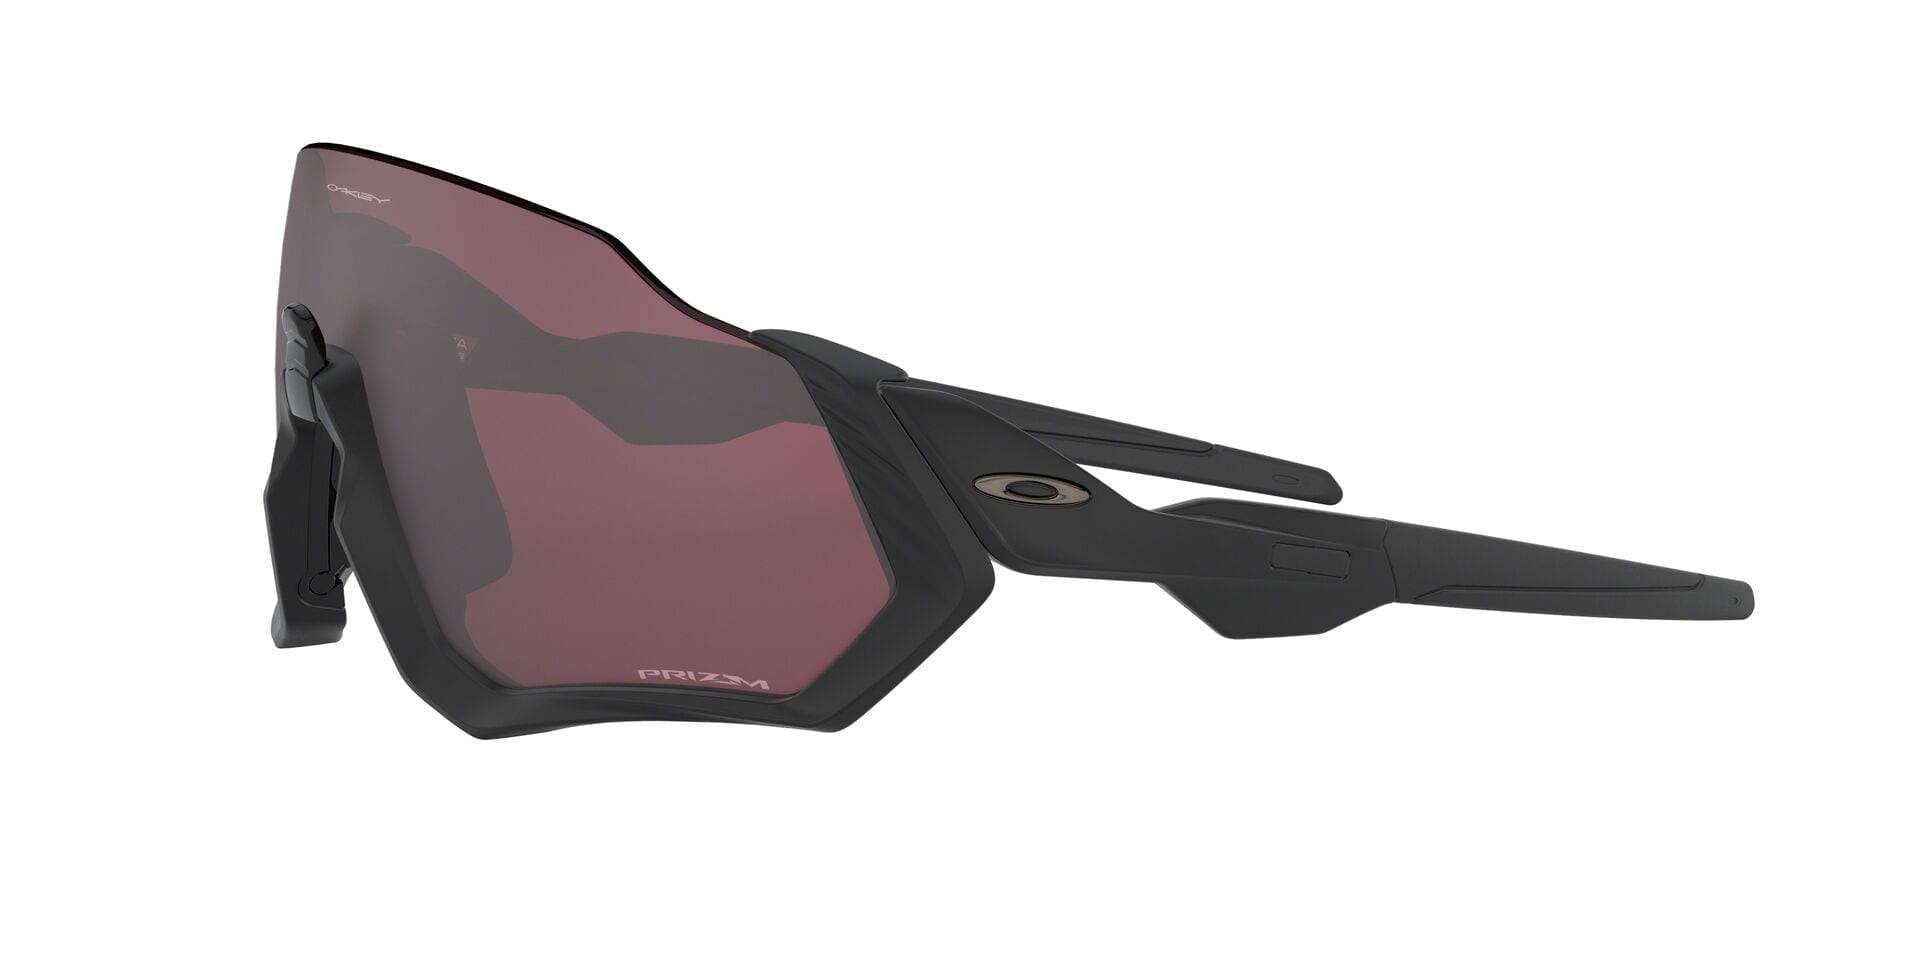 bb1dc17c809a9 Oakley Prizm Road Black Color Addition Men s Sunglasses - ADS Lifestyle